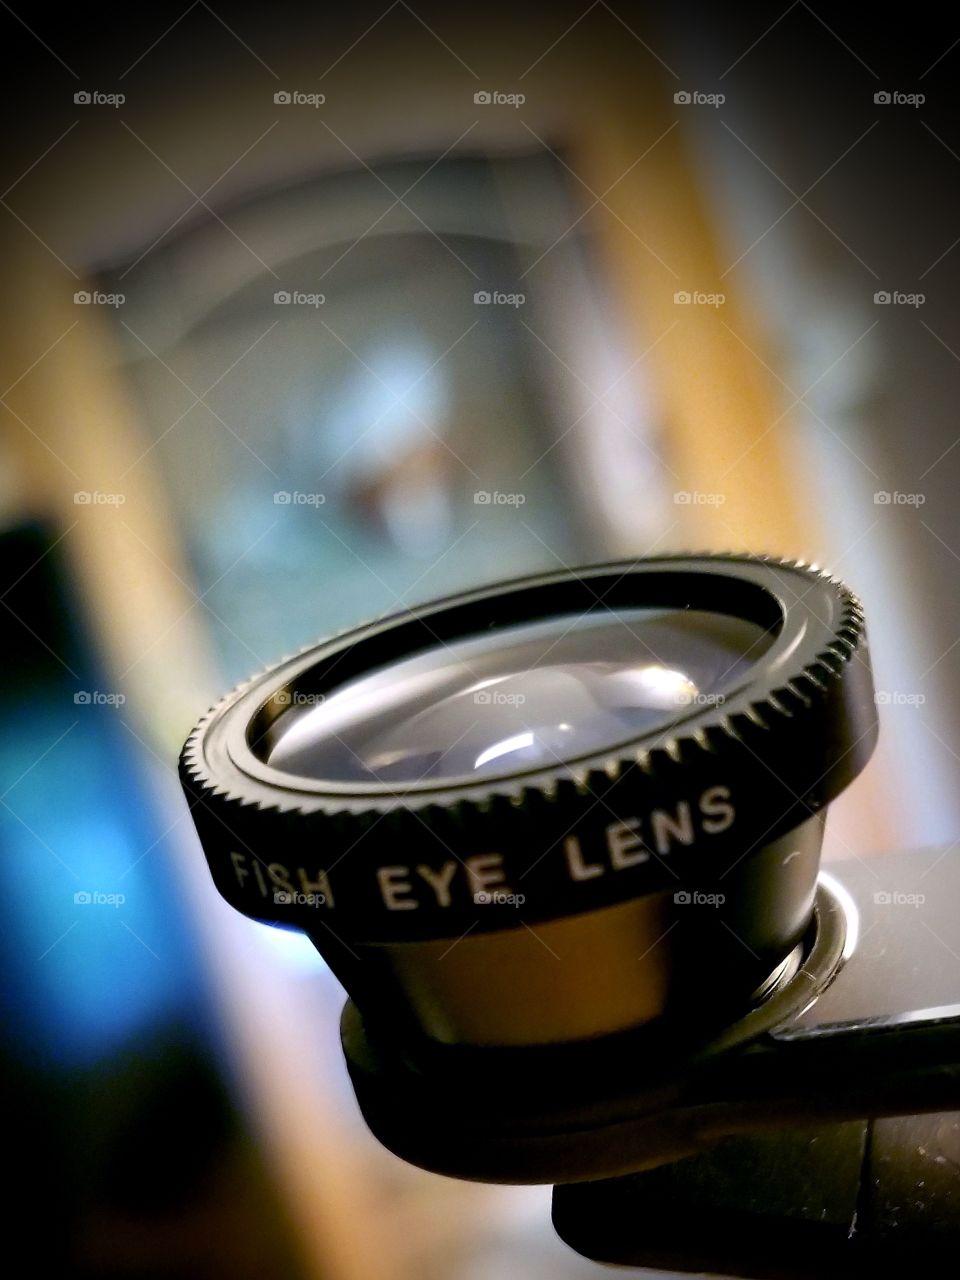 clip on optical improvements